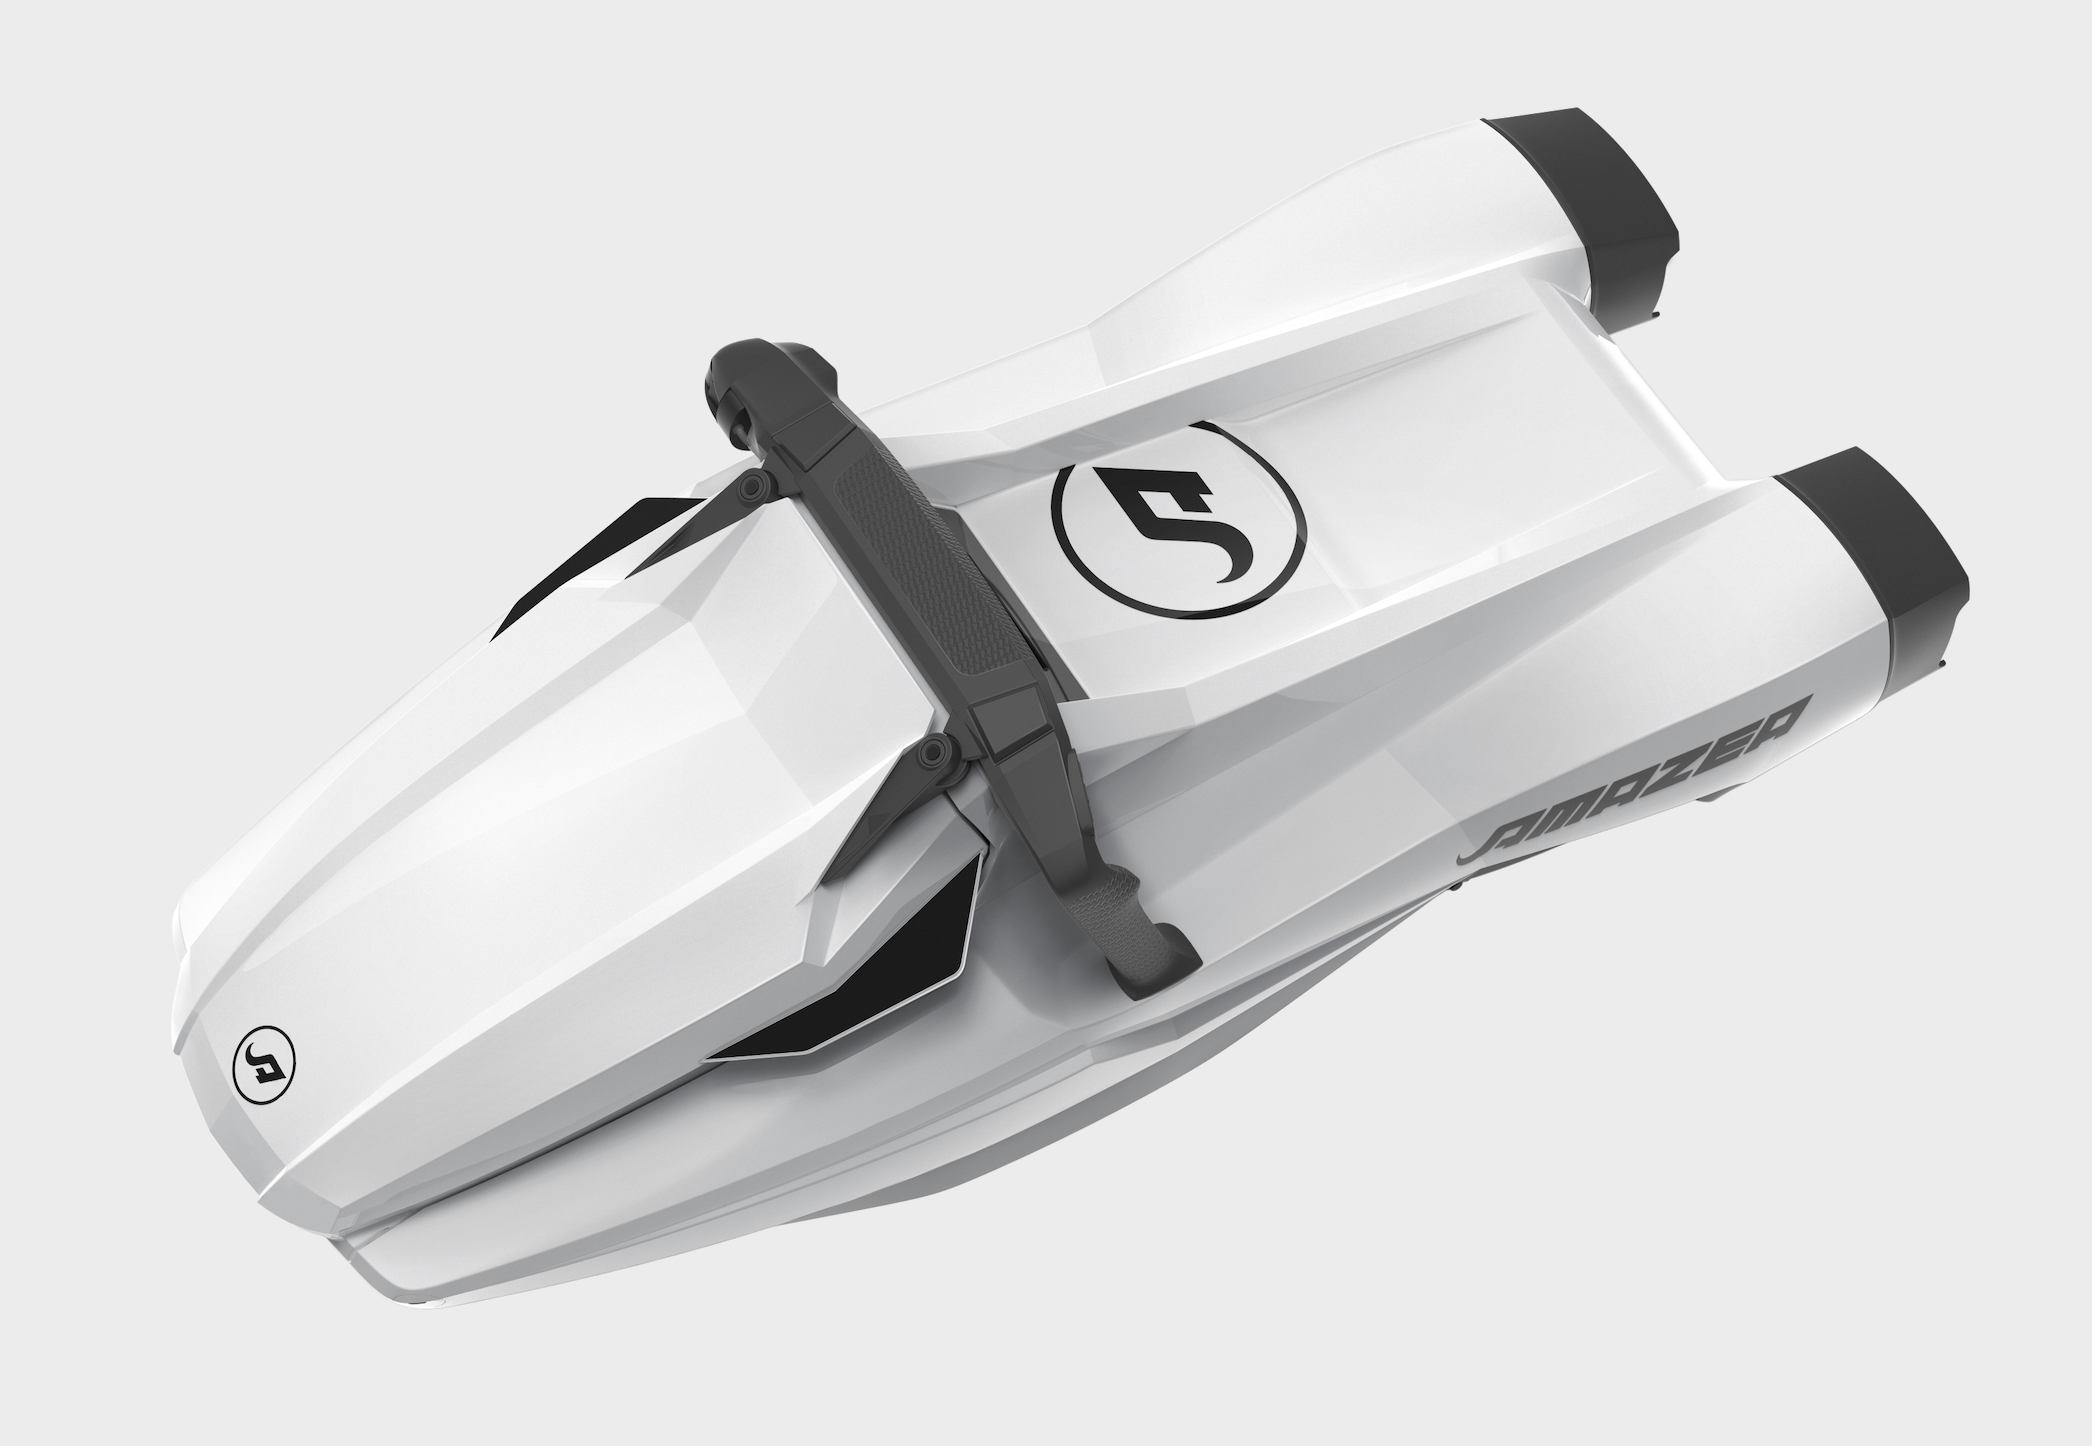 sea scooter amazea blanc 3:4 avant